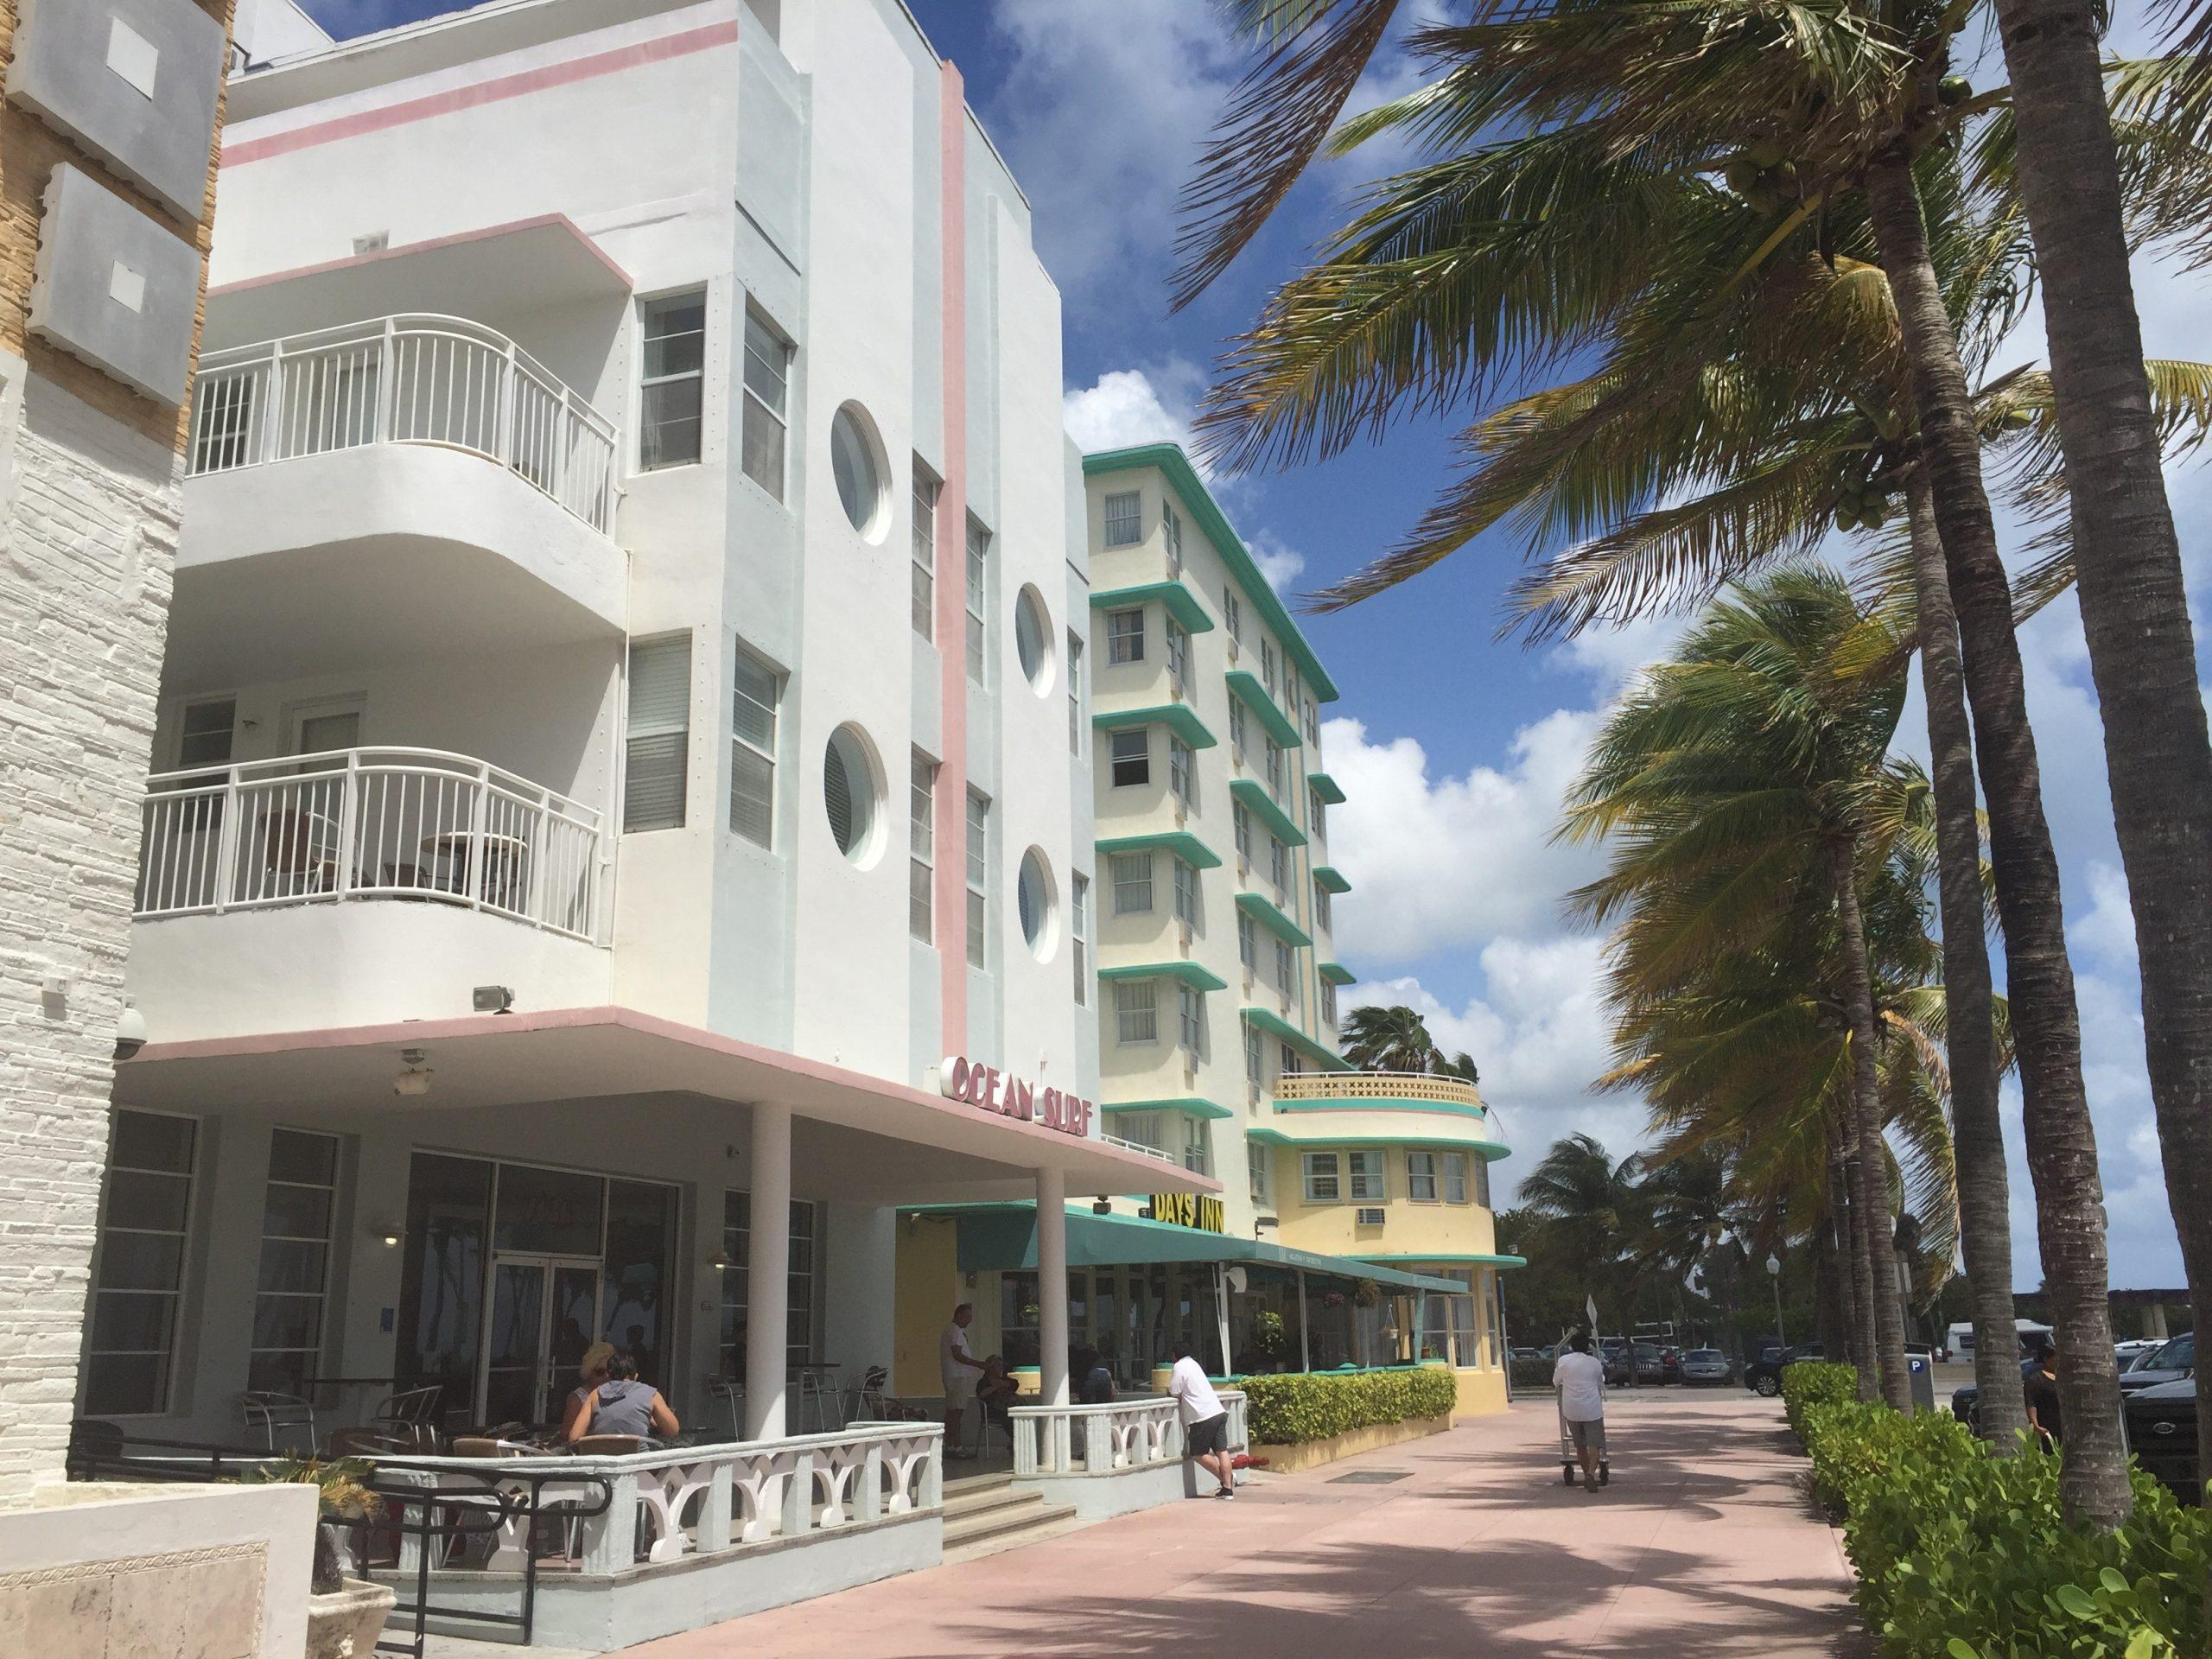 Ocean Surf and Broadmoor Hotels of Ocean Terrace